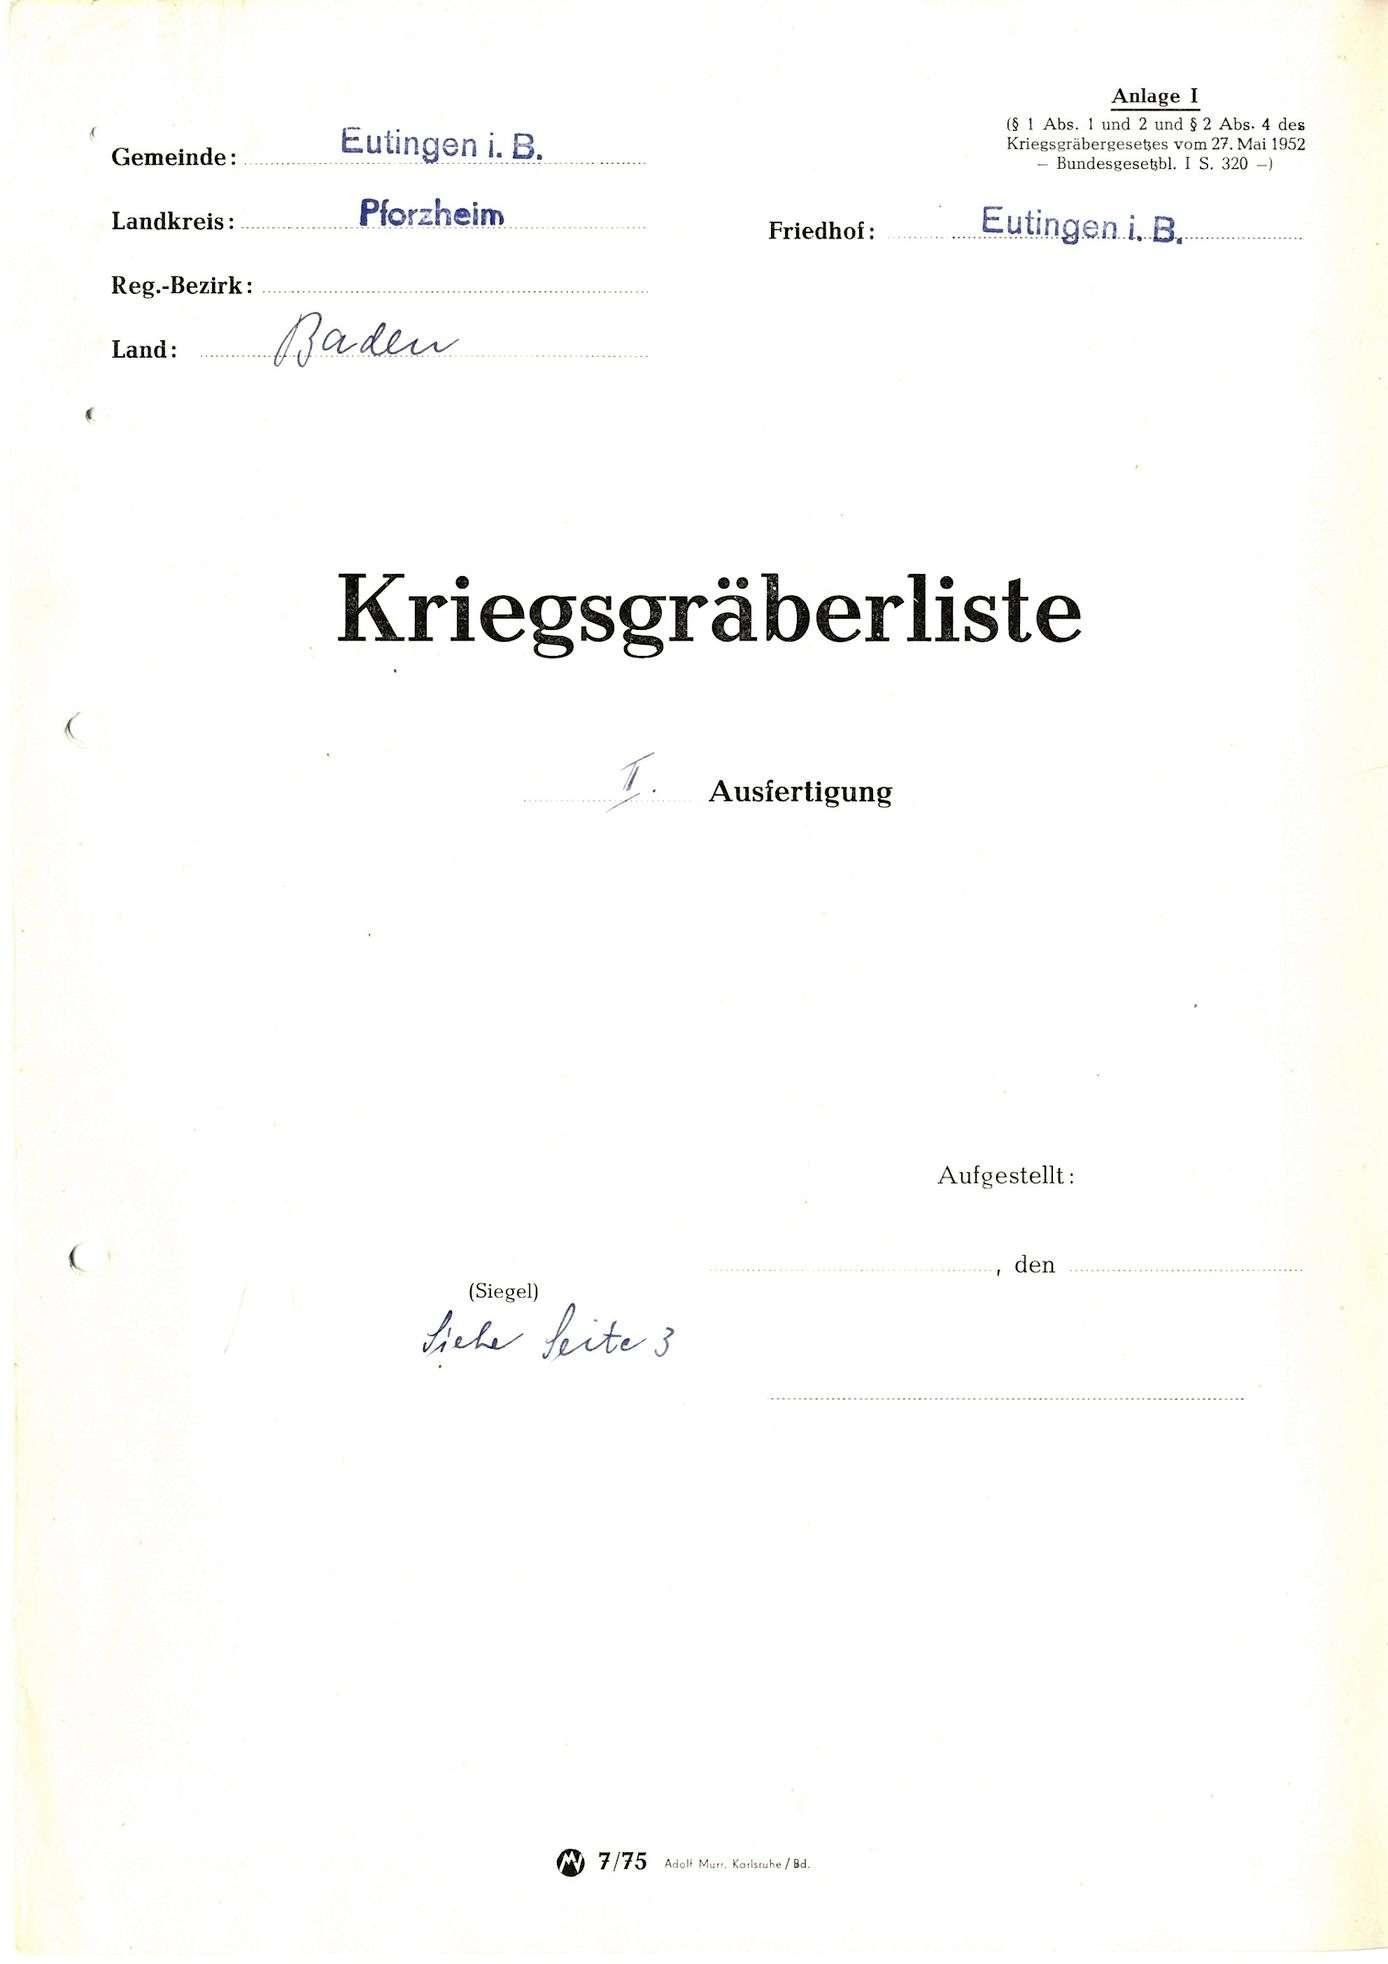 Eutingen, Bild 1